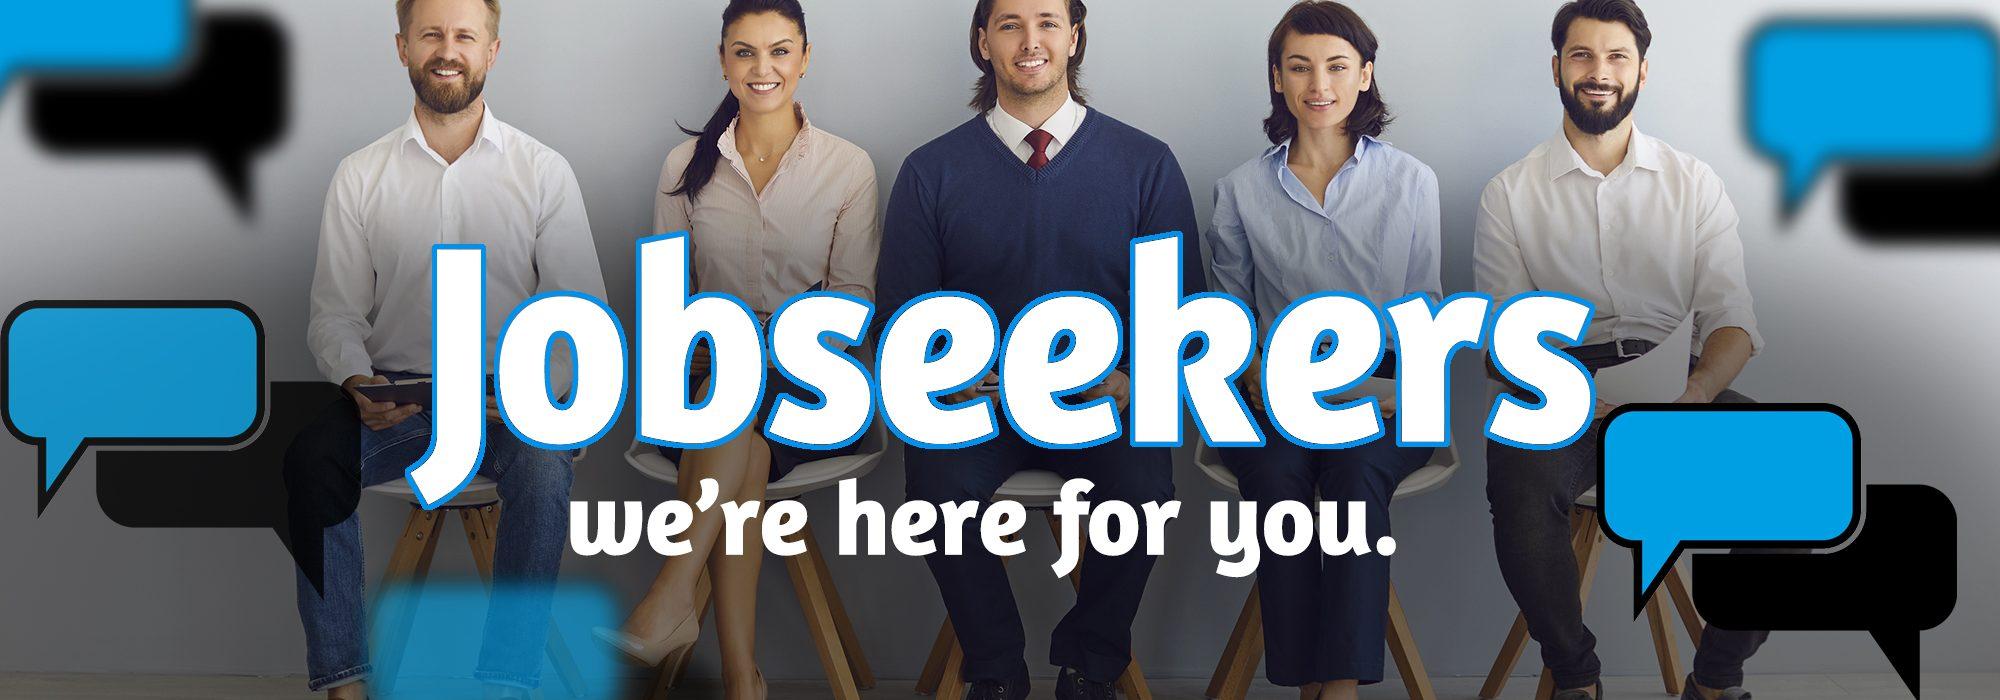 totally recruitment jobseekers